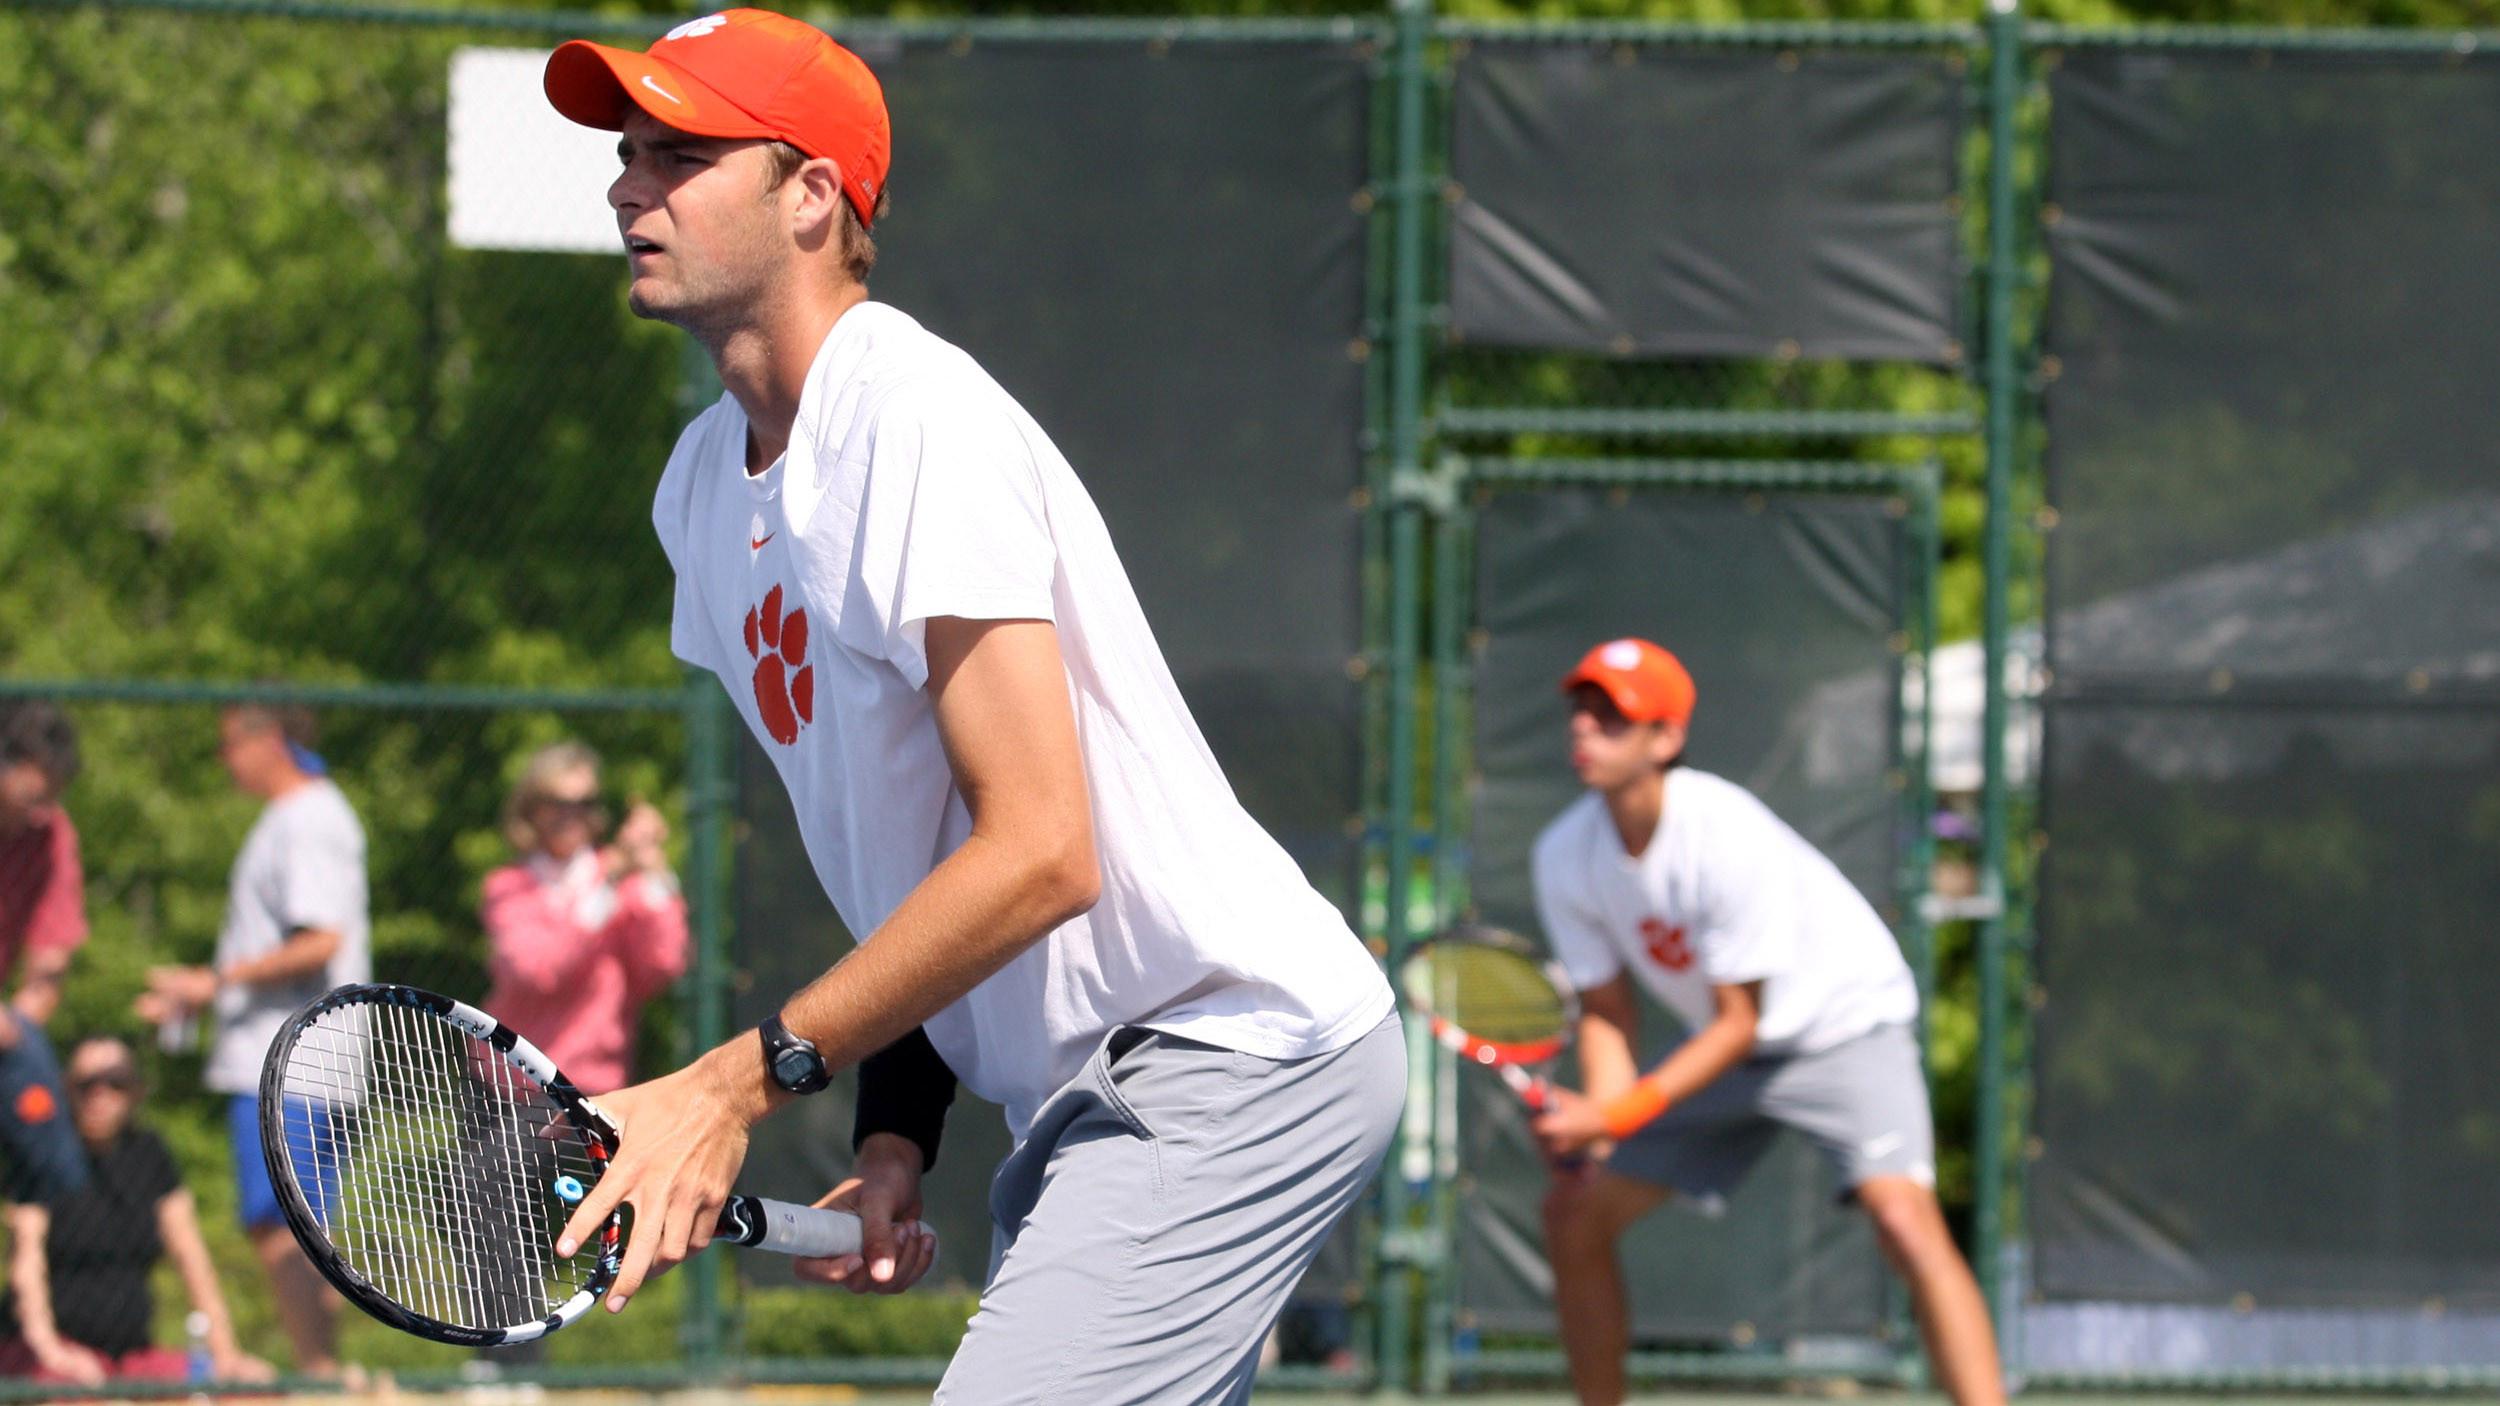 Clemson Men?s Tennis Ranked 23rd